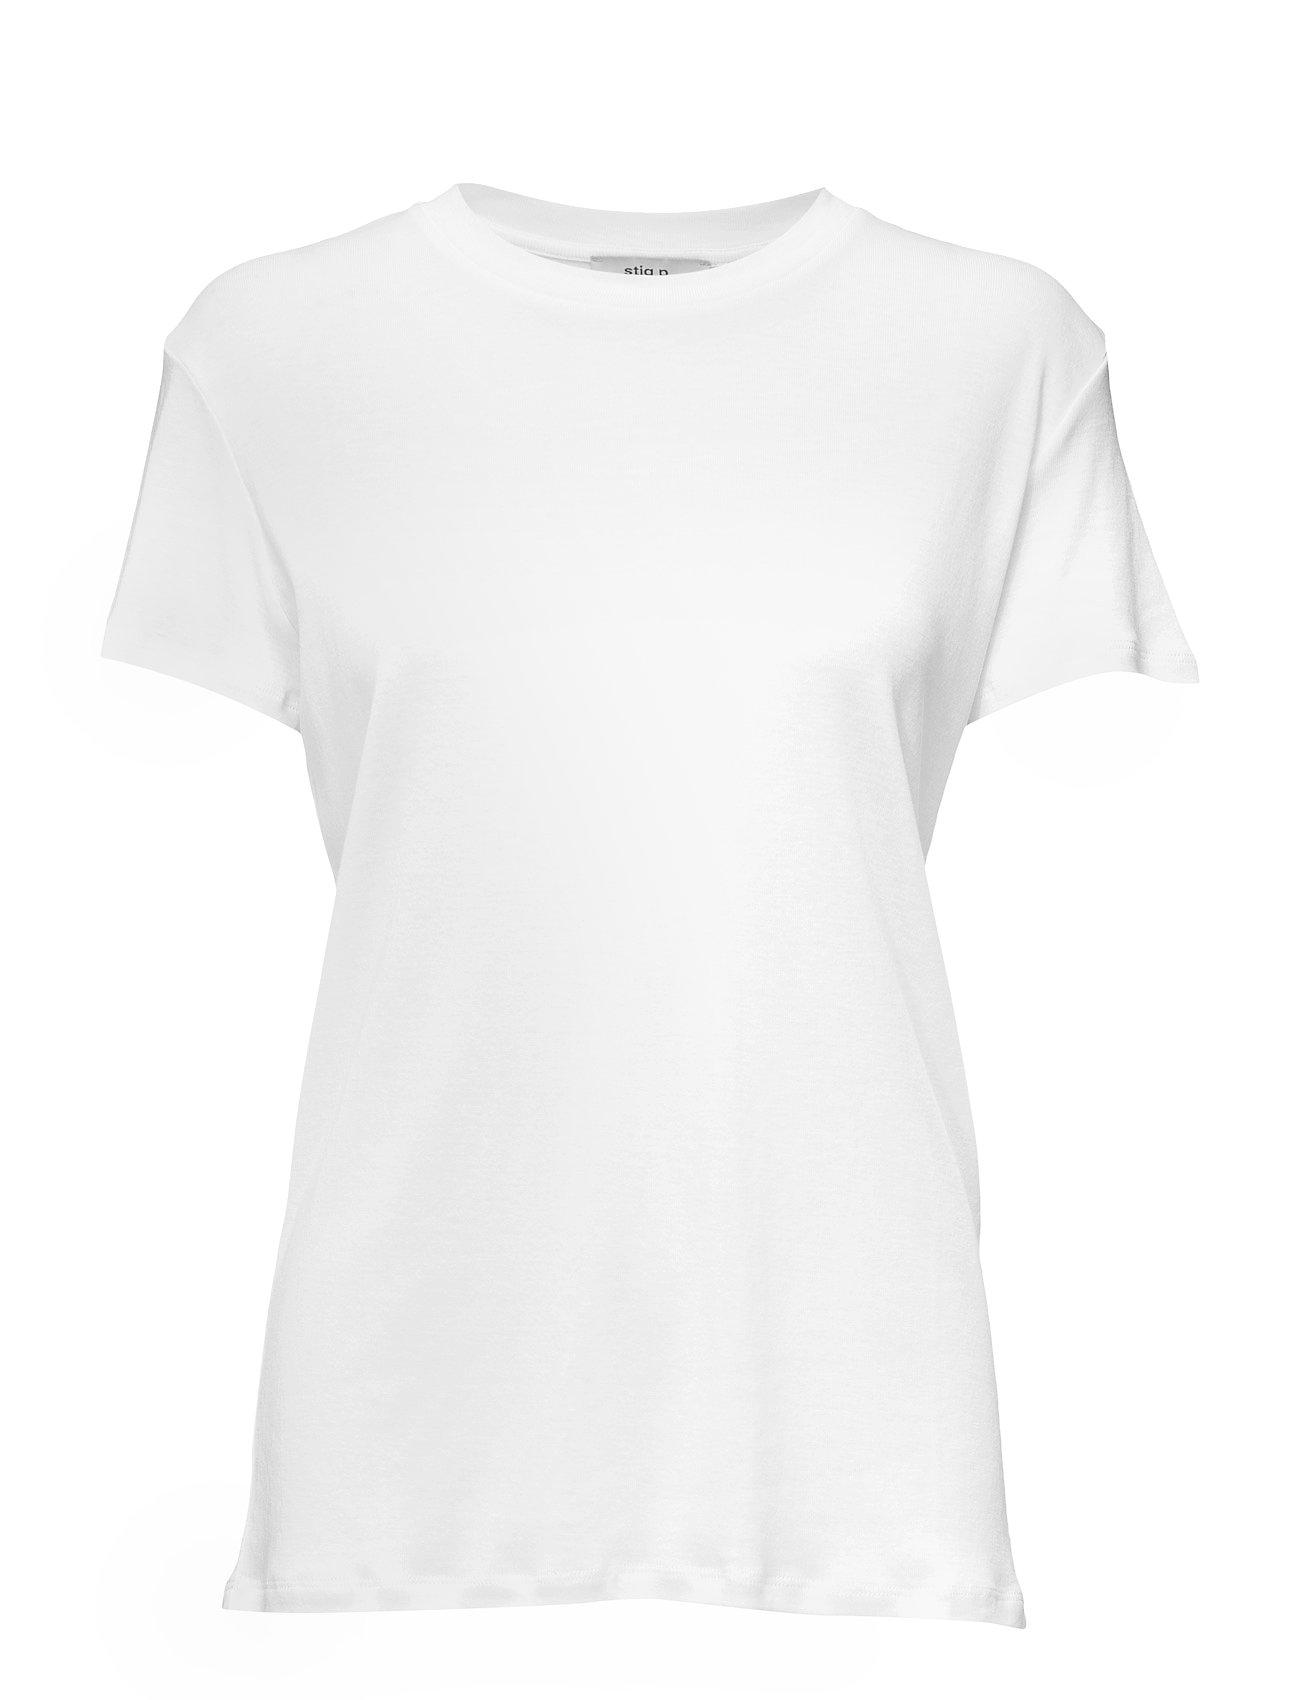 Stig P Sava T shirt Ögrönlar